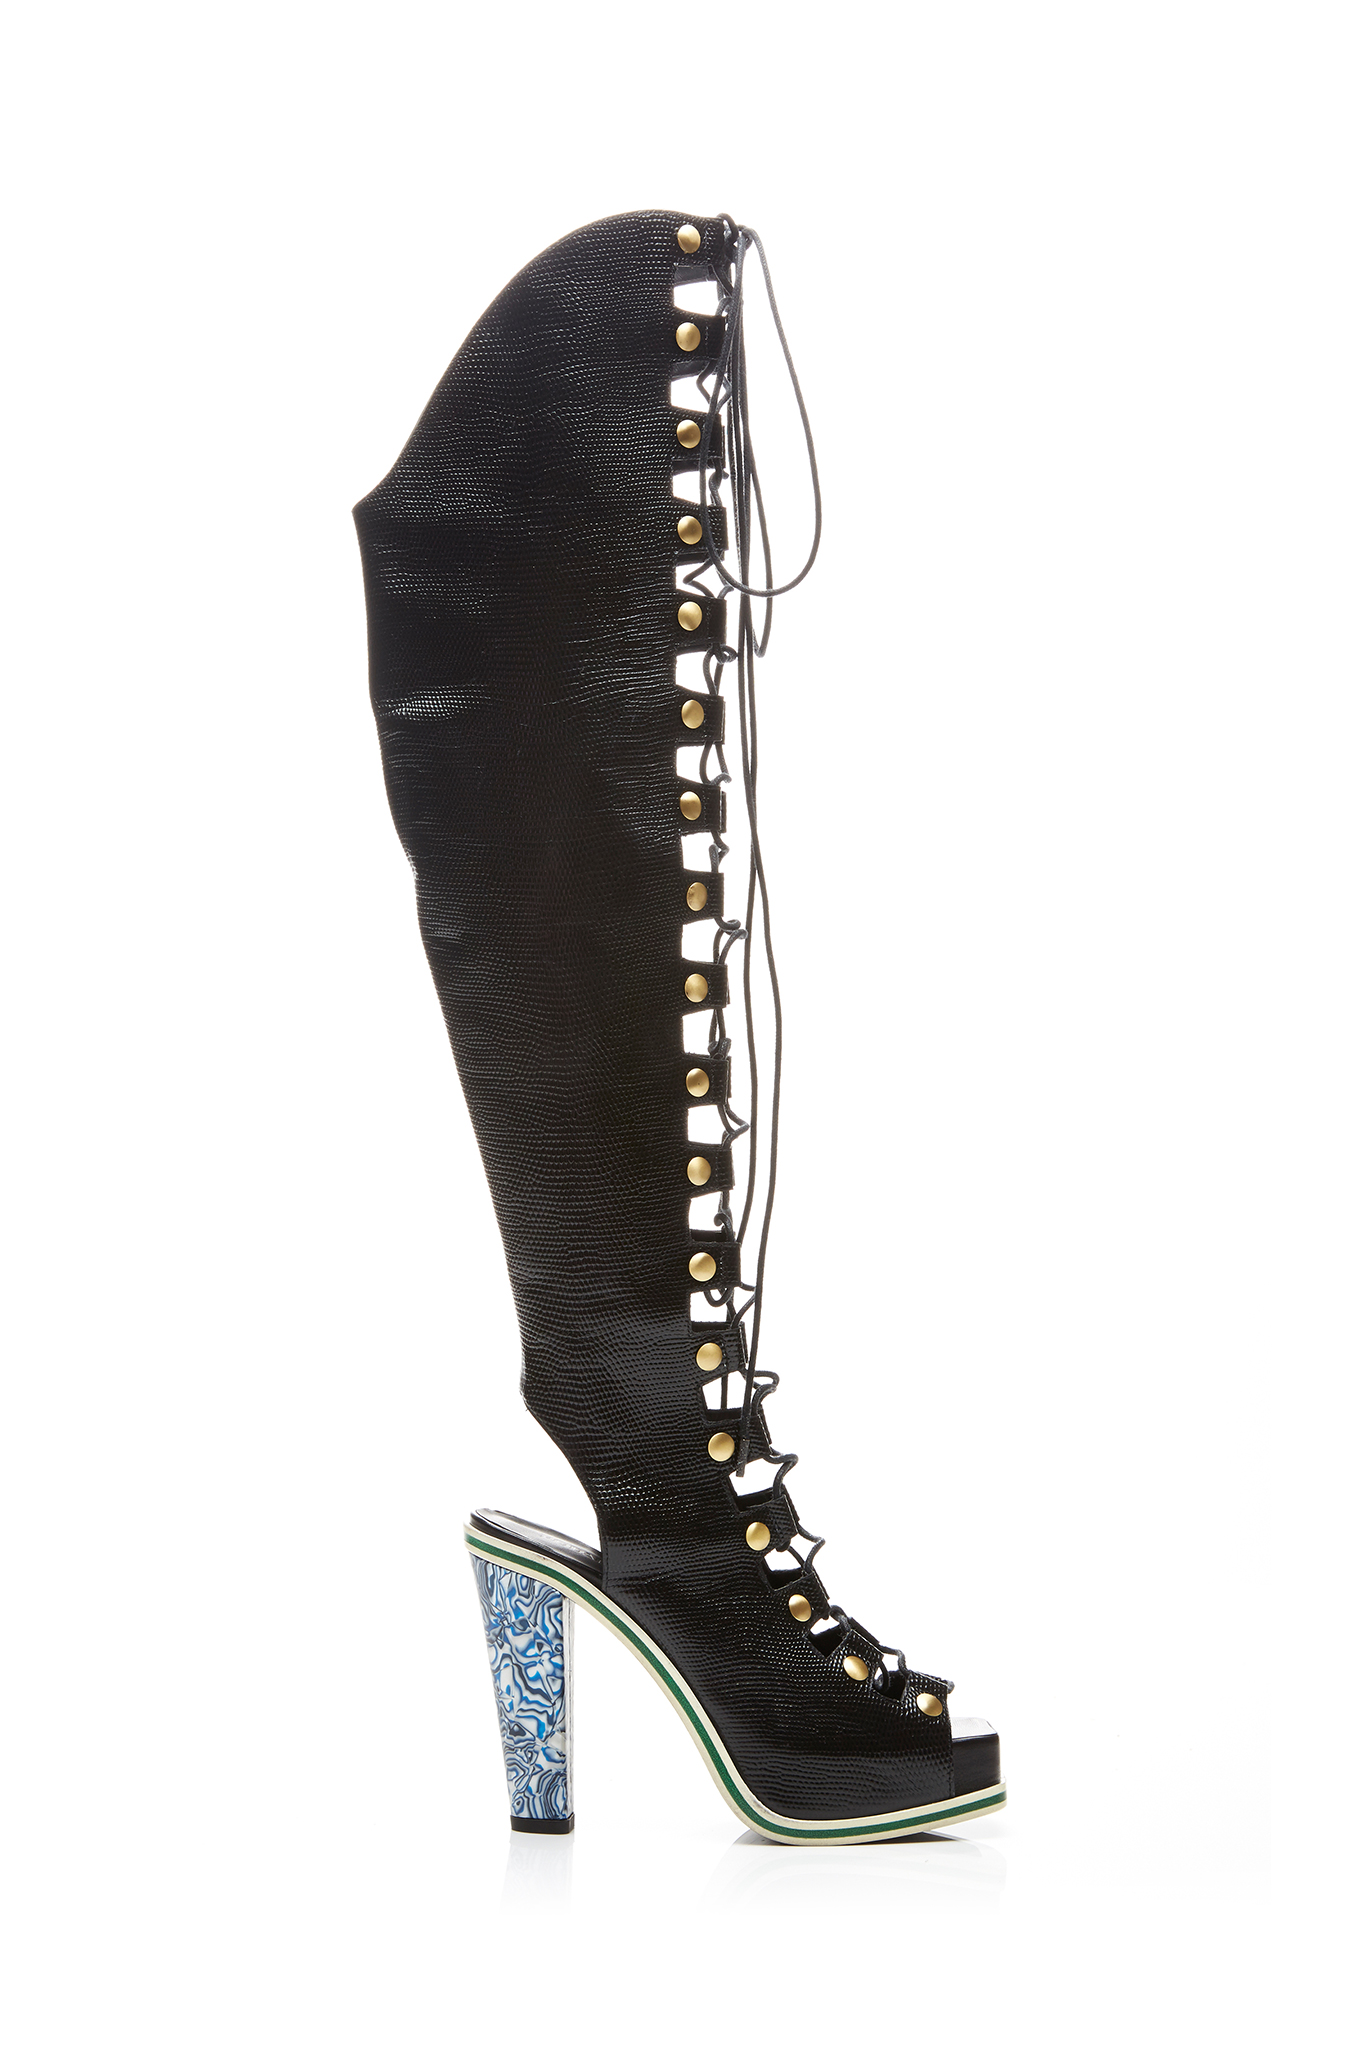 03-02-heeled-gladiator.jpg